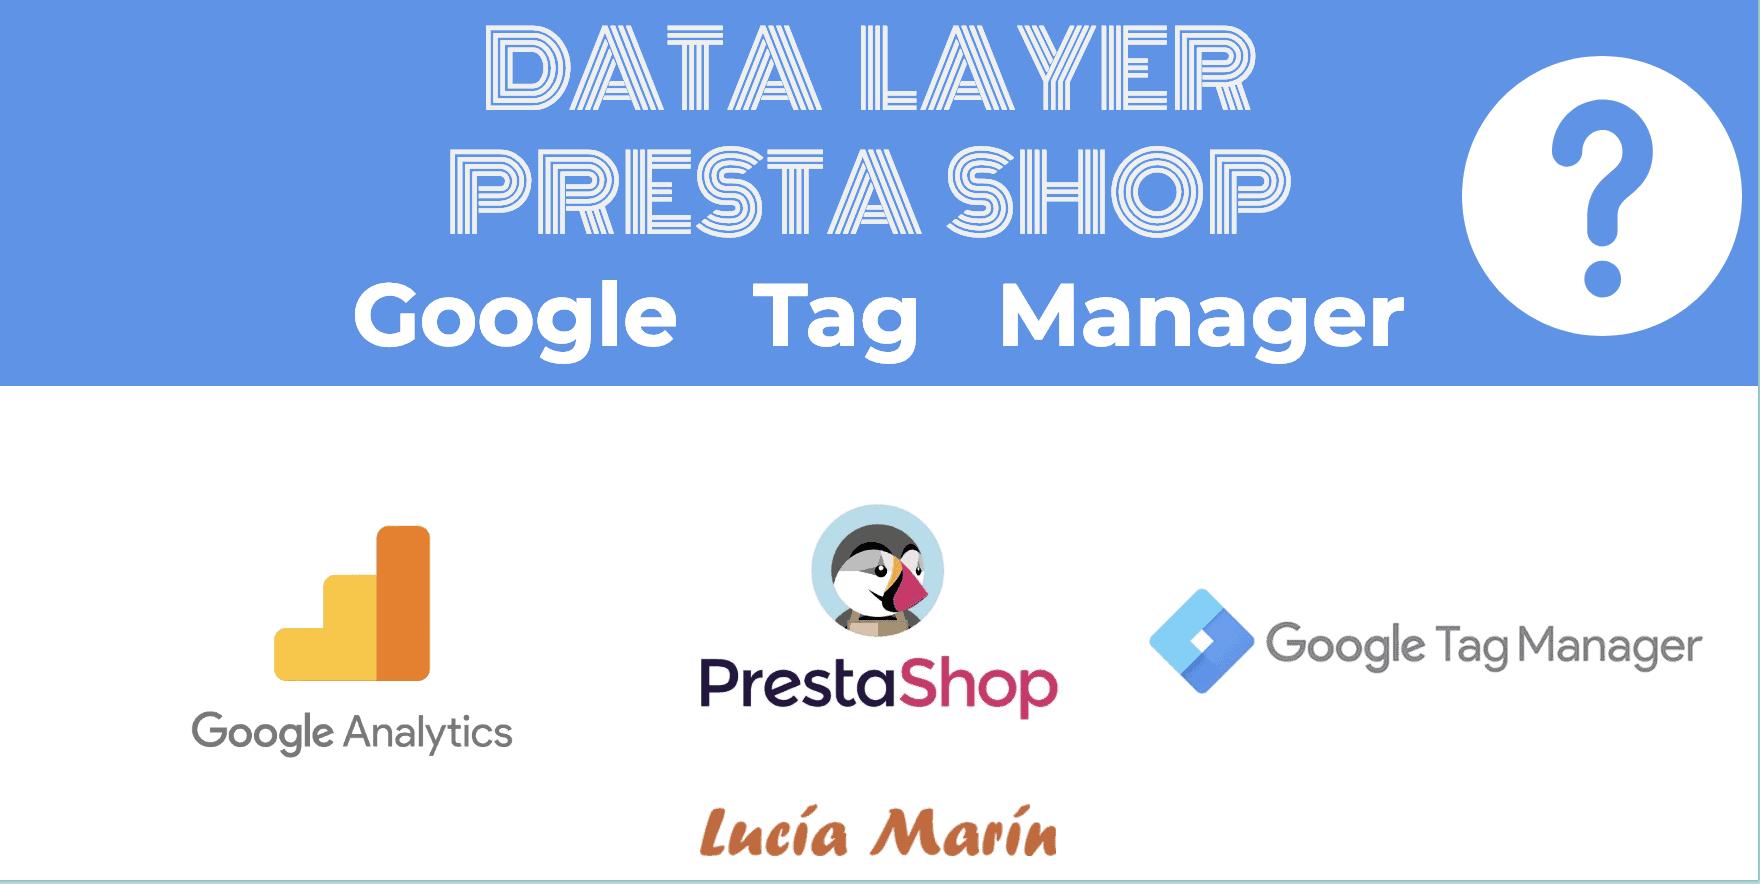 datalayer-prestashop